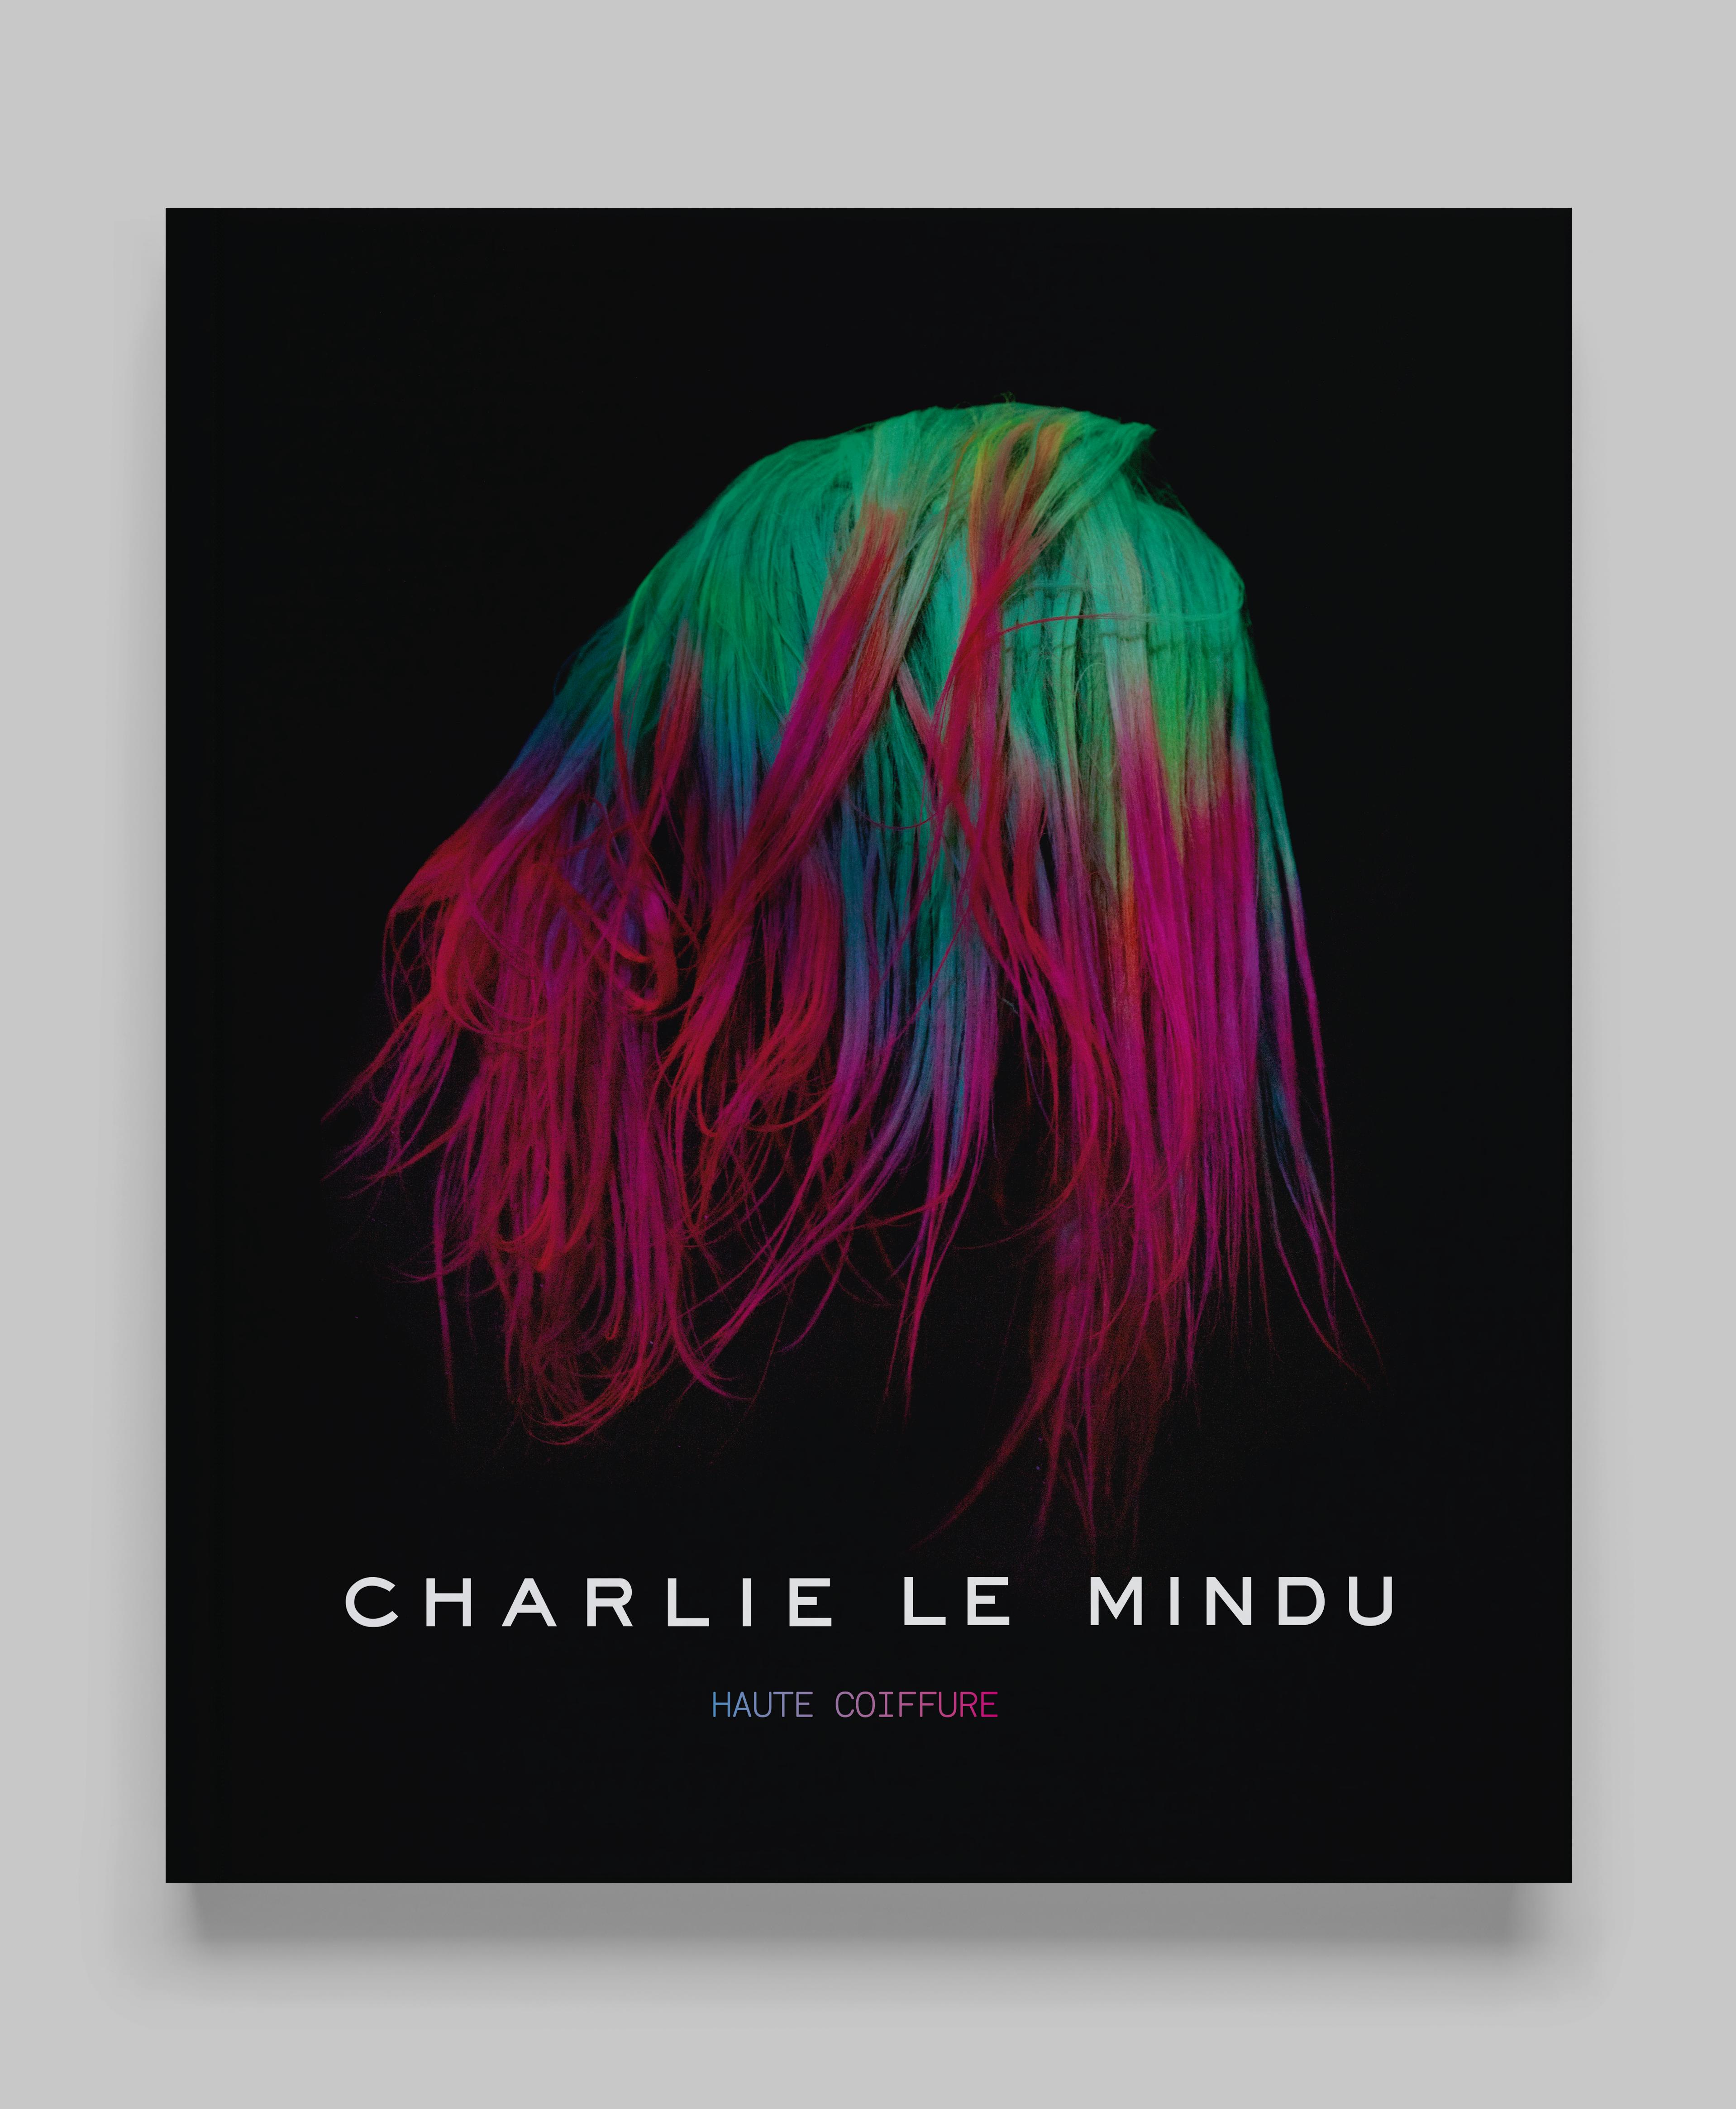 Cover image: Charlie Le Mindu – Haute Coiffure